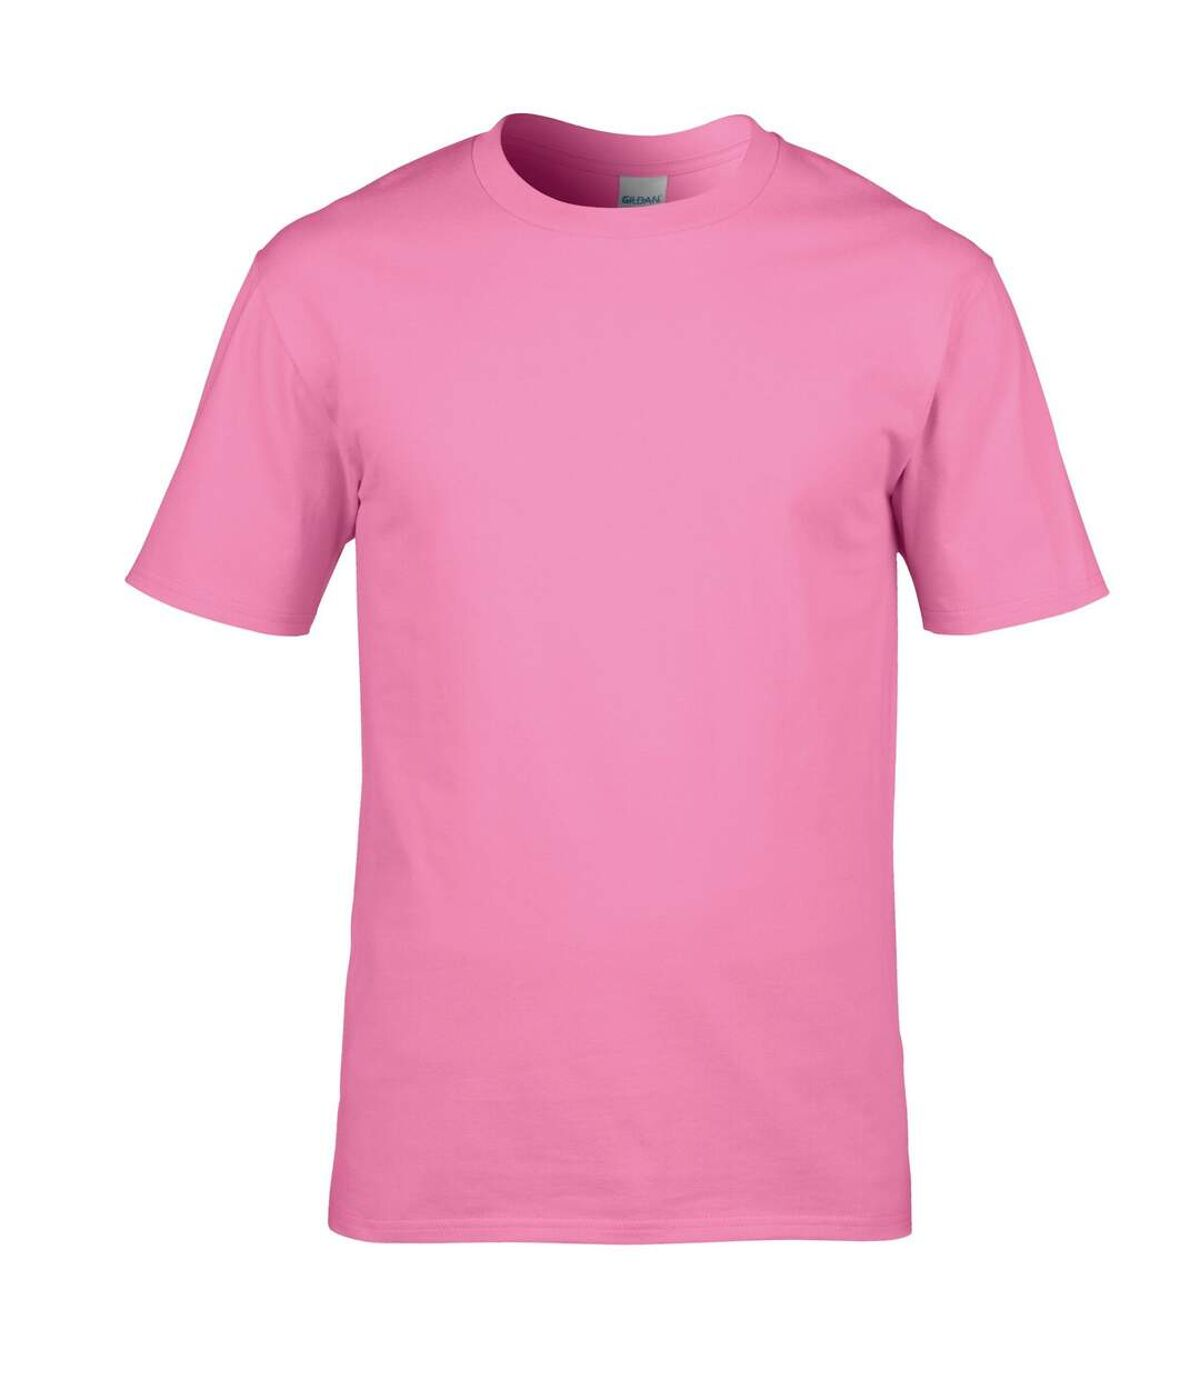 Gildan Mens Premium Cotton Ring Spun Short Sleeve T-Shirt (Azalea) - UTBC480